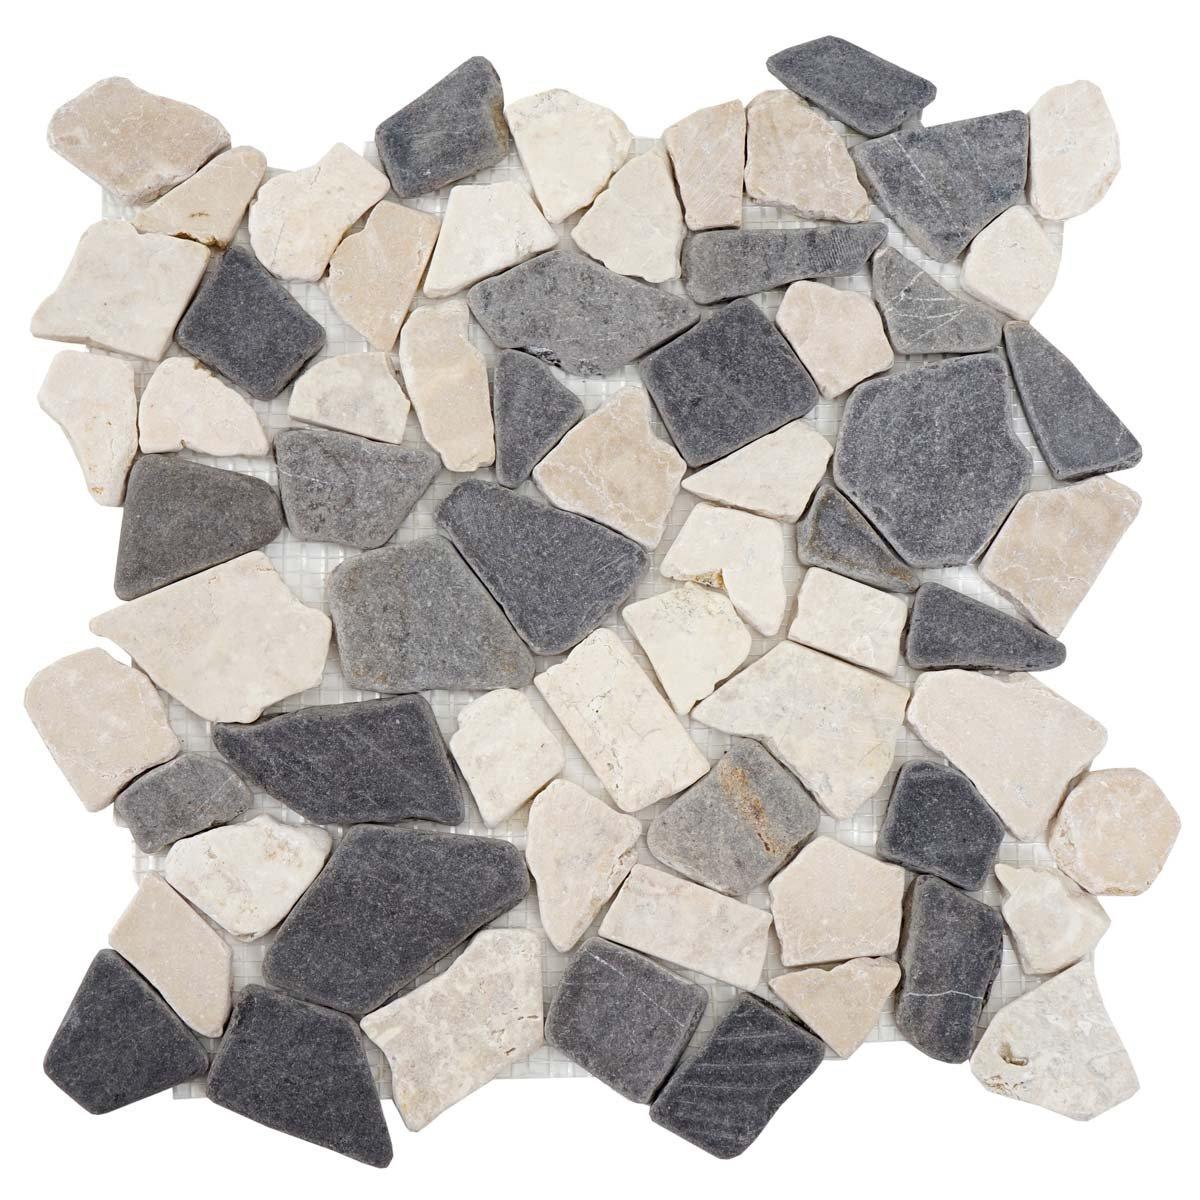 11 St/ück je 30x30cm = 1qm ~ grau-wei/ß Mendler Steinfliesen Vigo T687 Marmor Naturstein-Fliese Mosaik